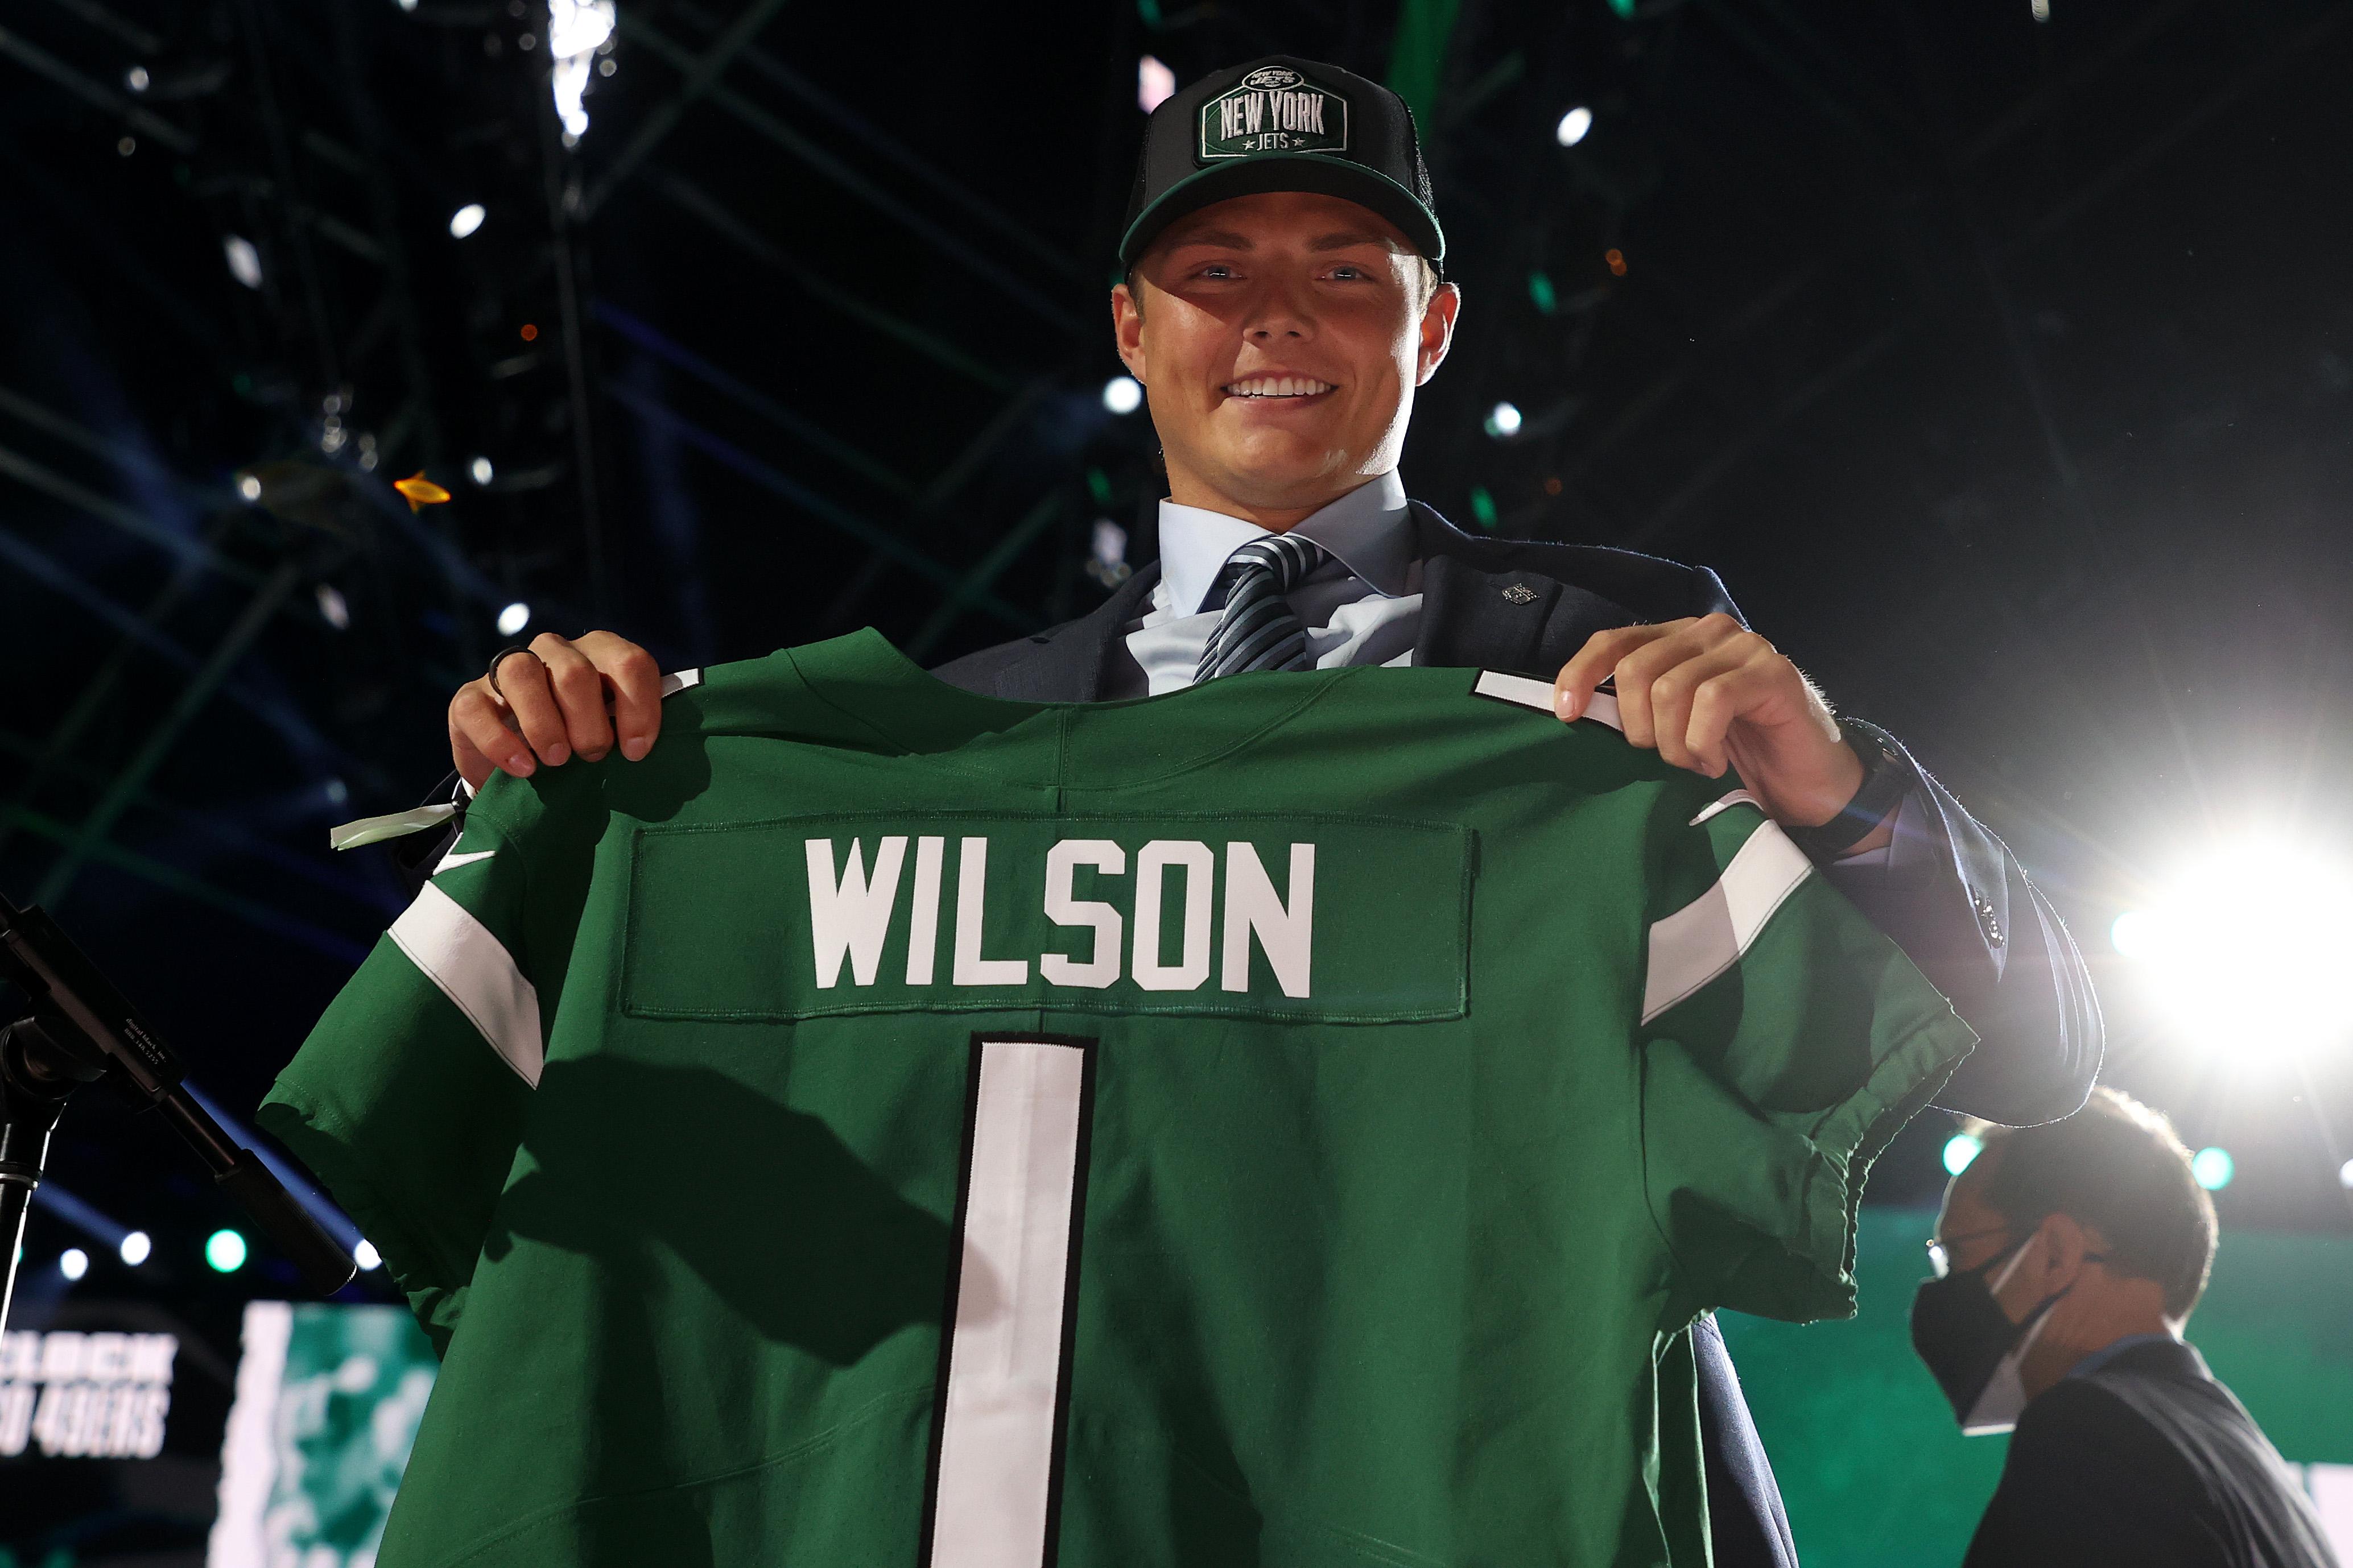 Zach Wilson在2021年在2021年4月29日在俄亥俄州克利夫兰克利夫兰的克利夫兰的伟大湖泊科学中心的2021个NFL选秀中,在纽约喷气机第二次被纽约喷气式飞机中起床后,举行了一个球衣。